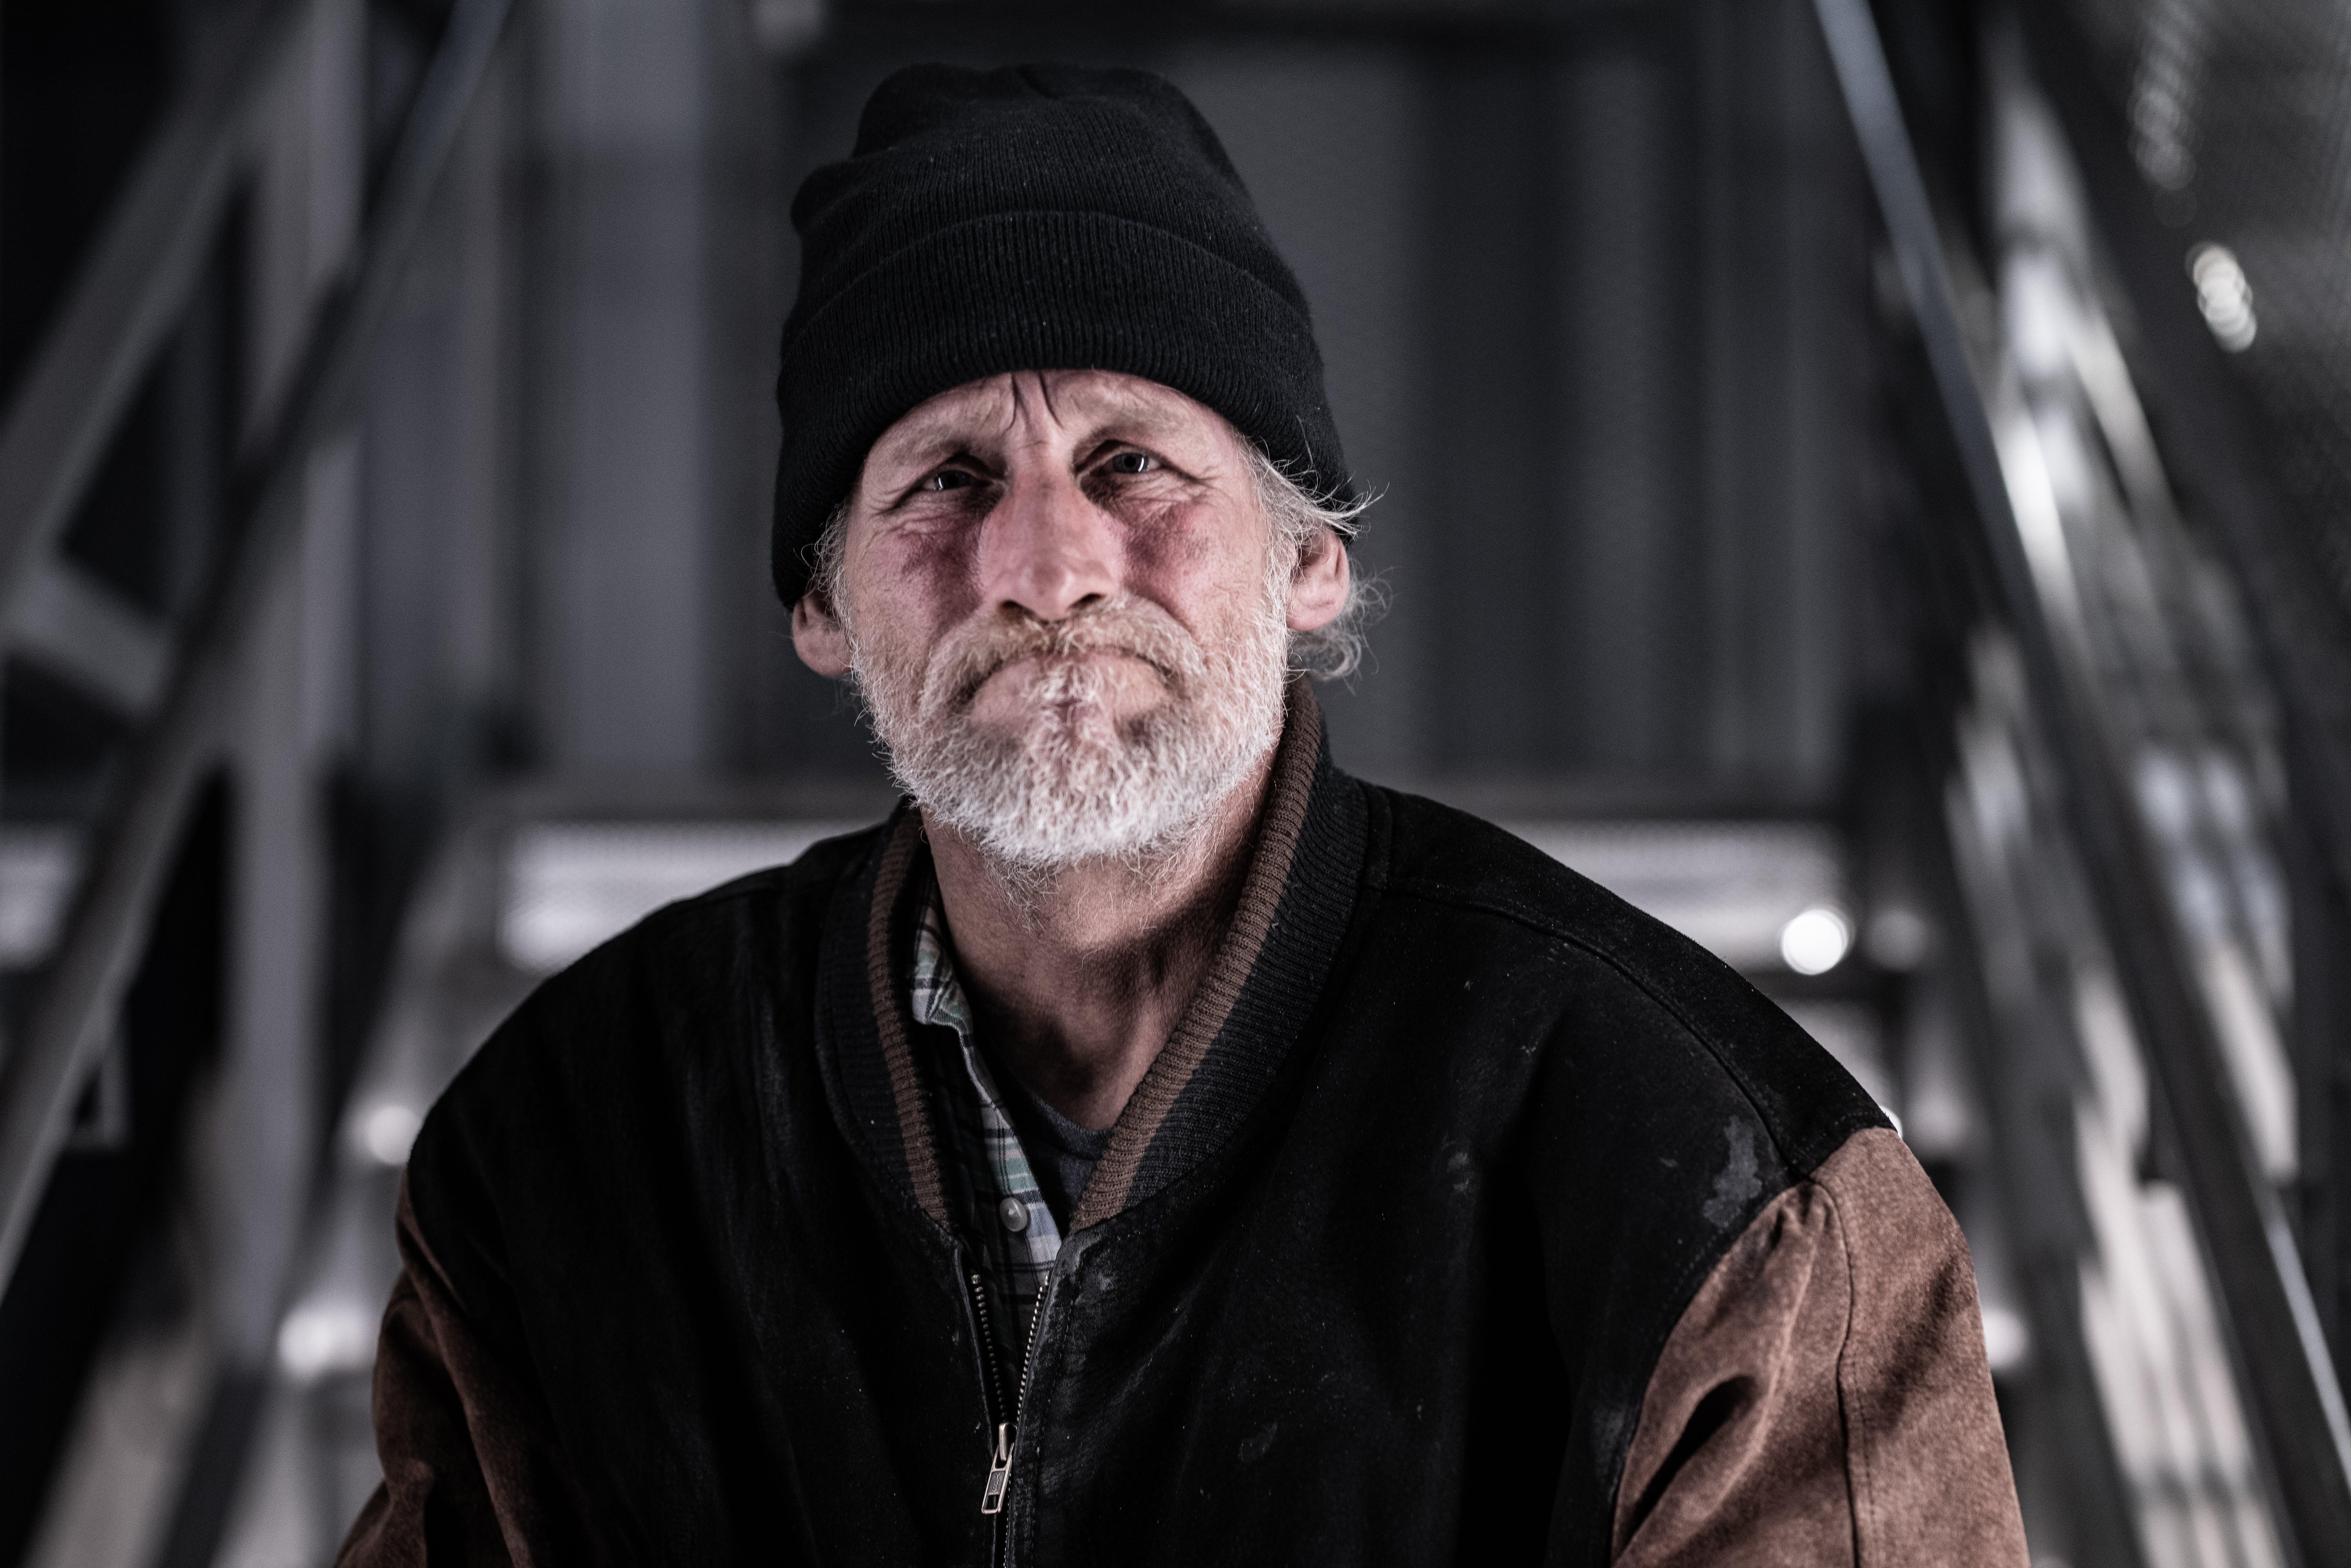 Free stock photo of beard, bearded, full beard, homeless